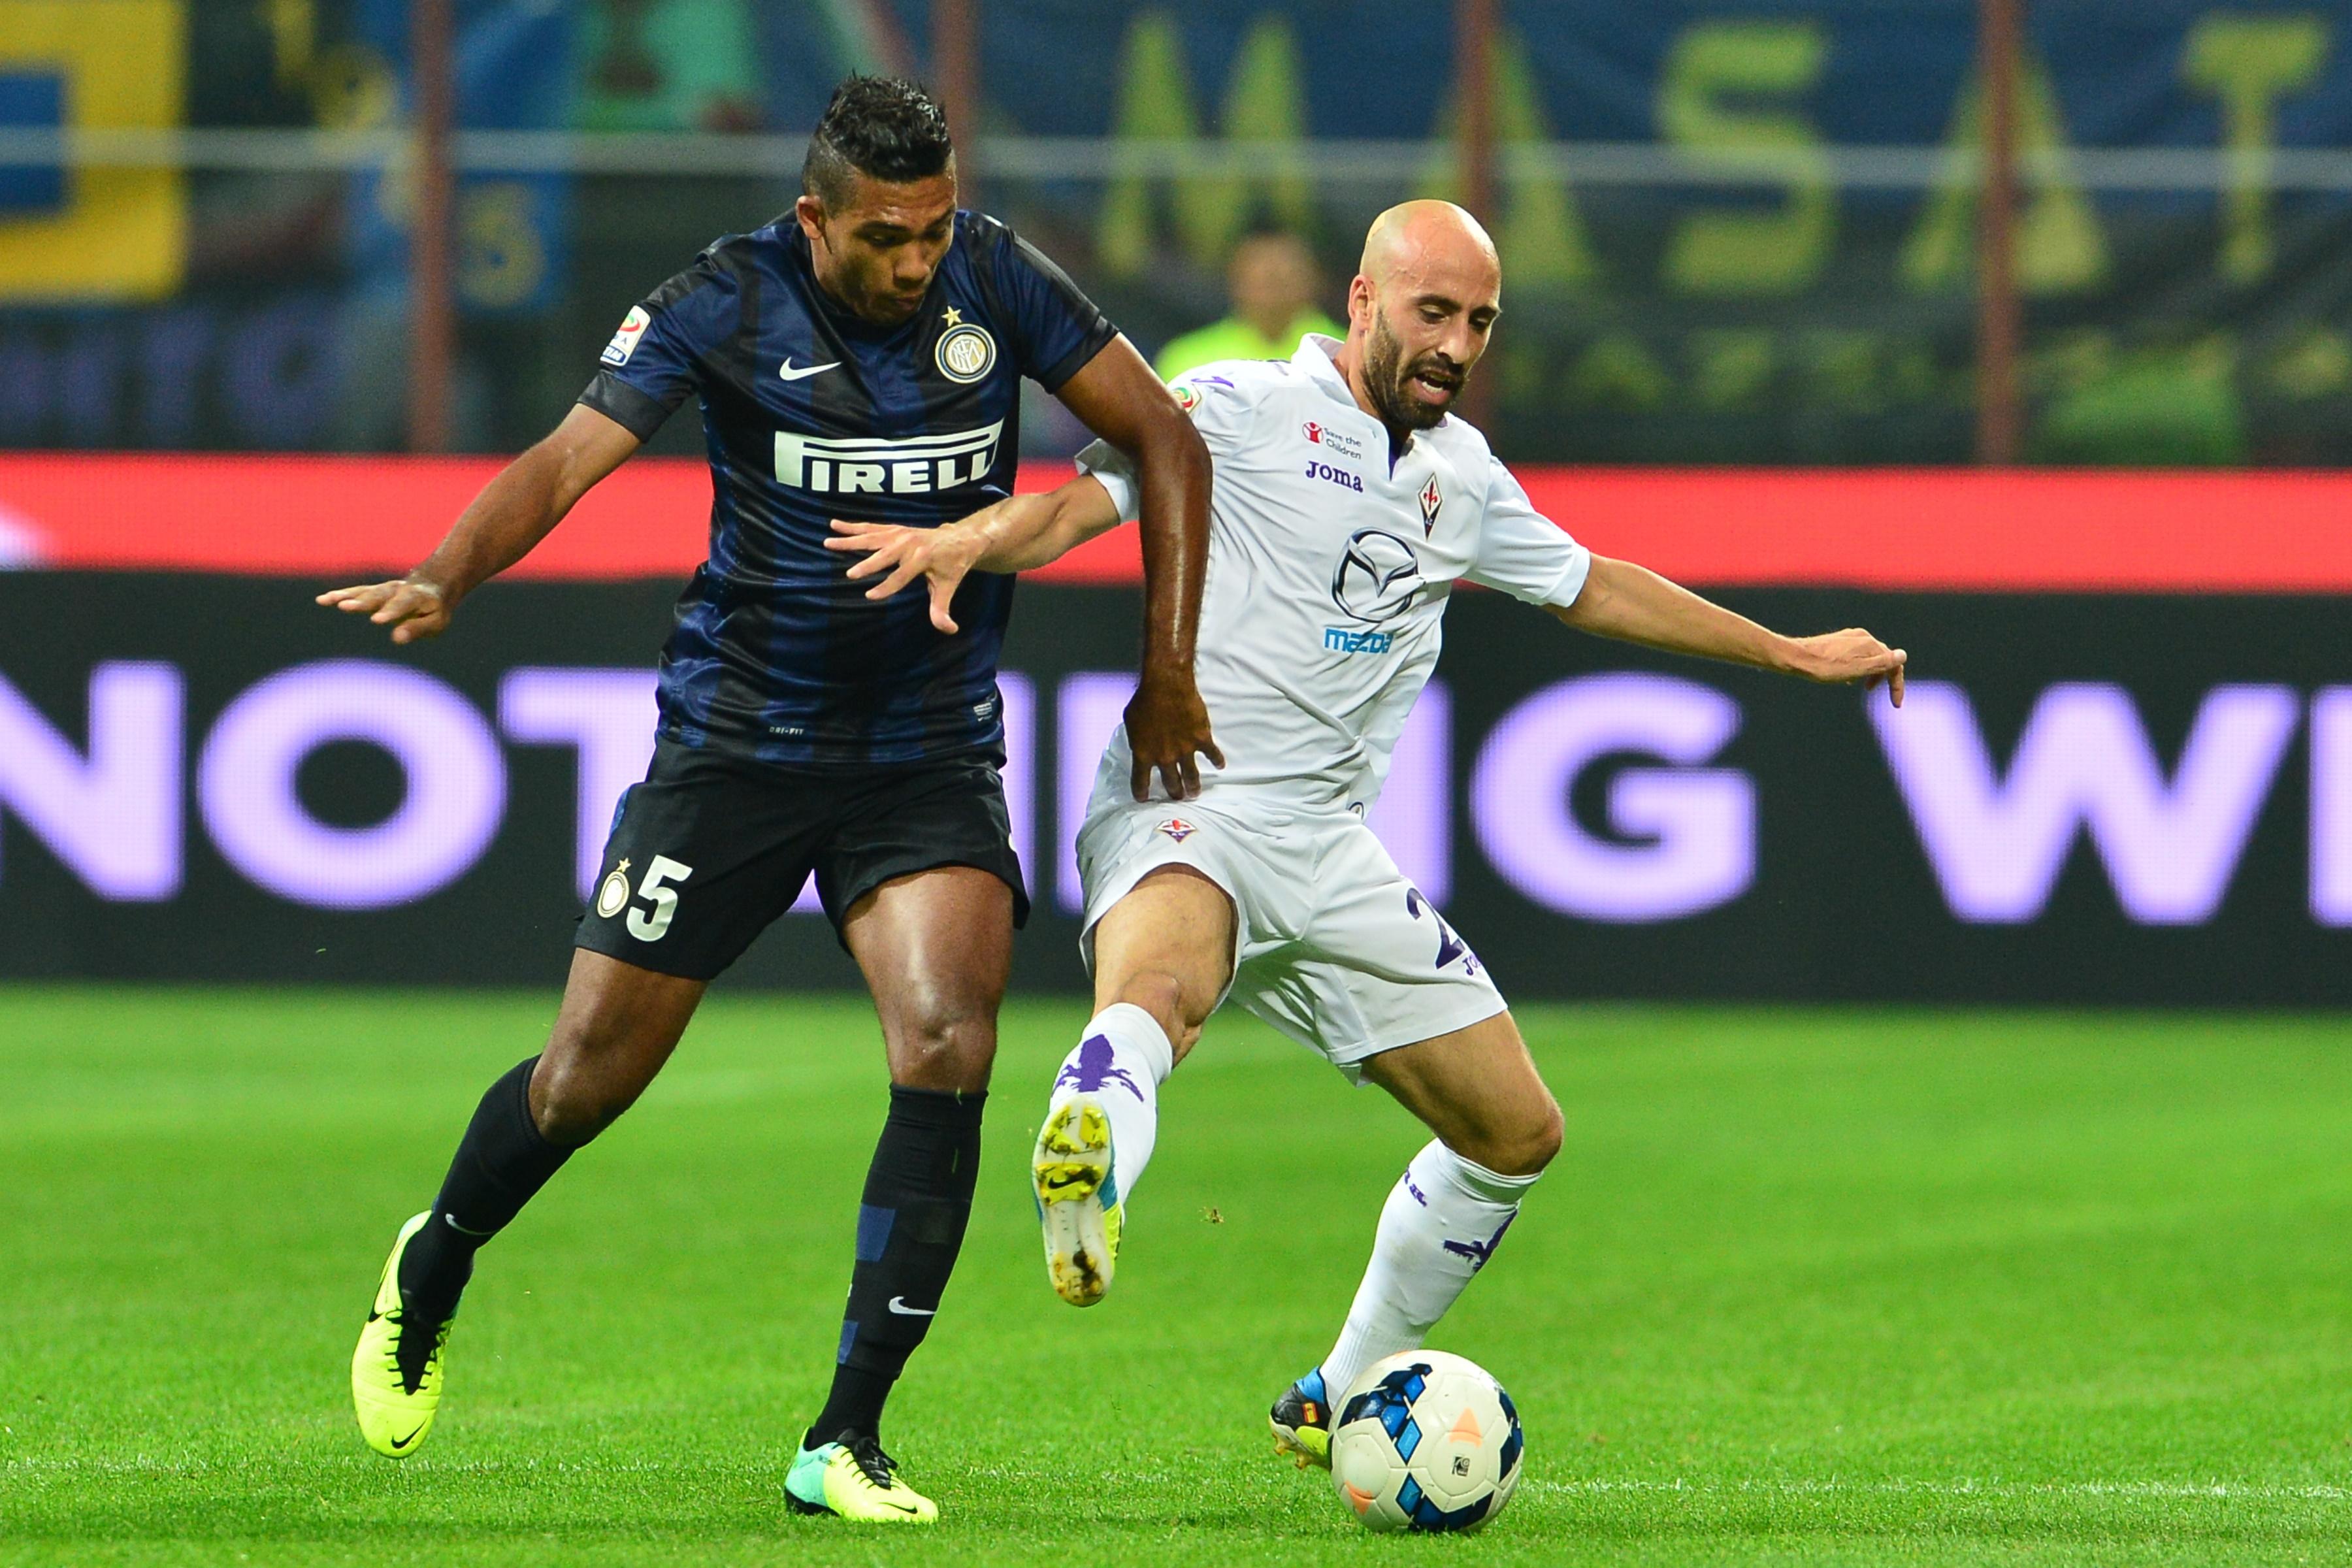 Pronostic Fiorentina – Inter 05.10.2014 thumbnail